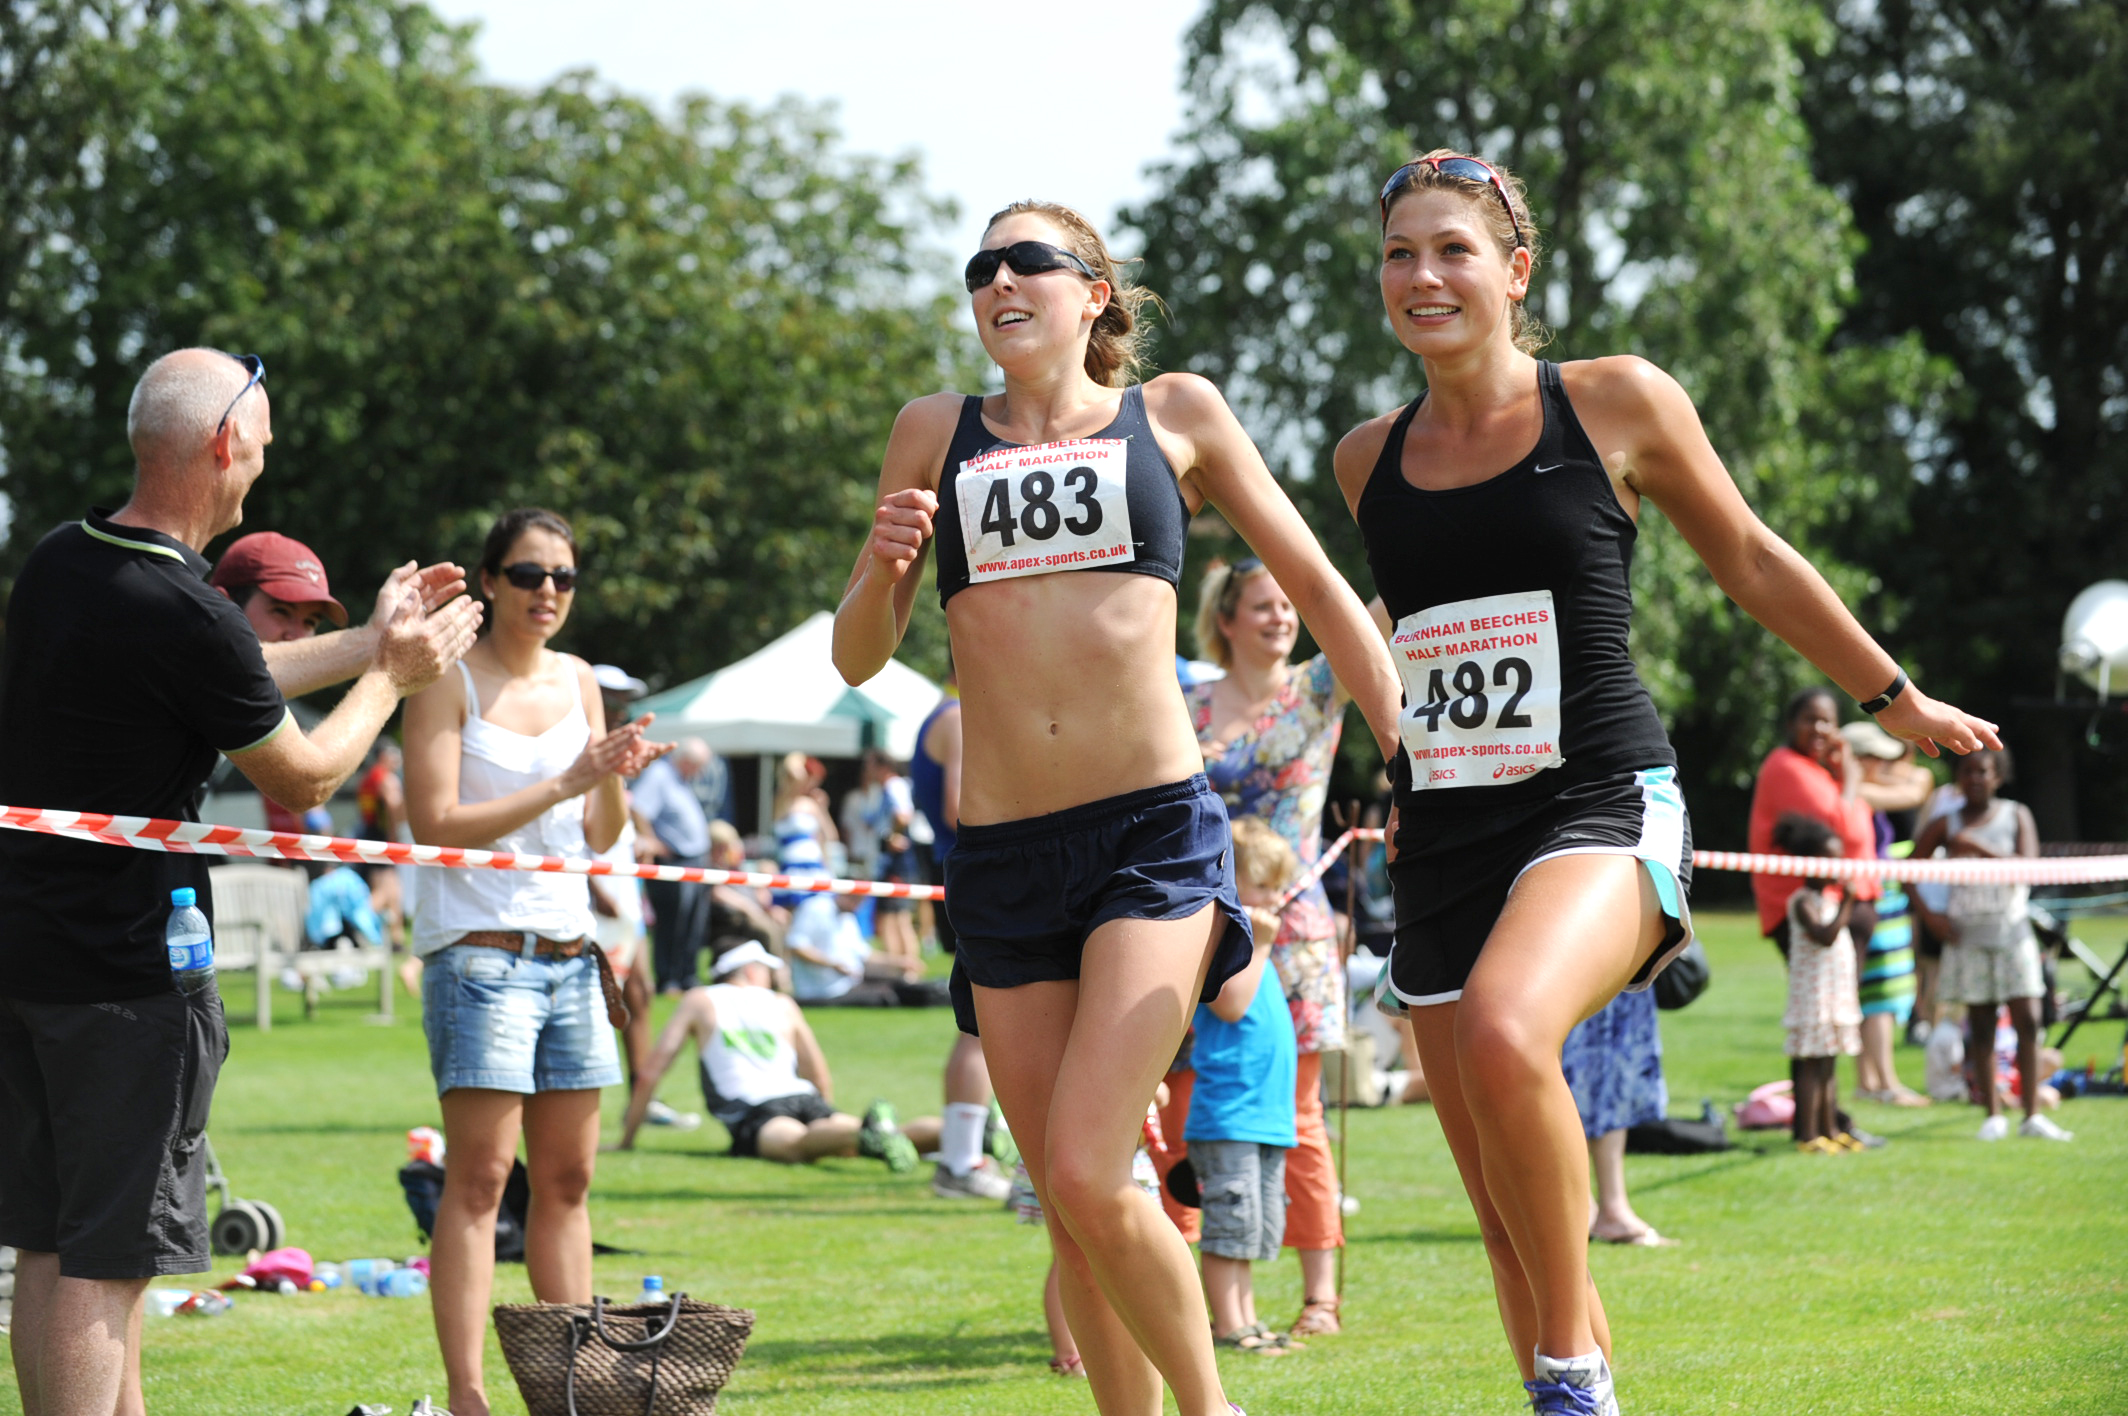 Burnham Beeches Half Marathon